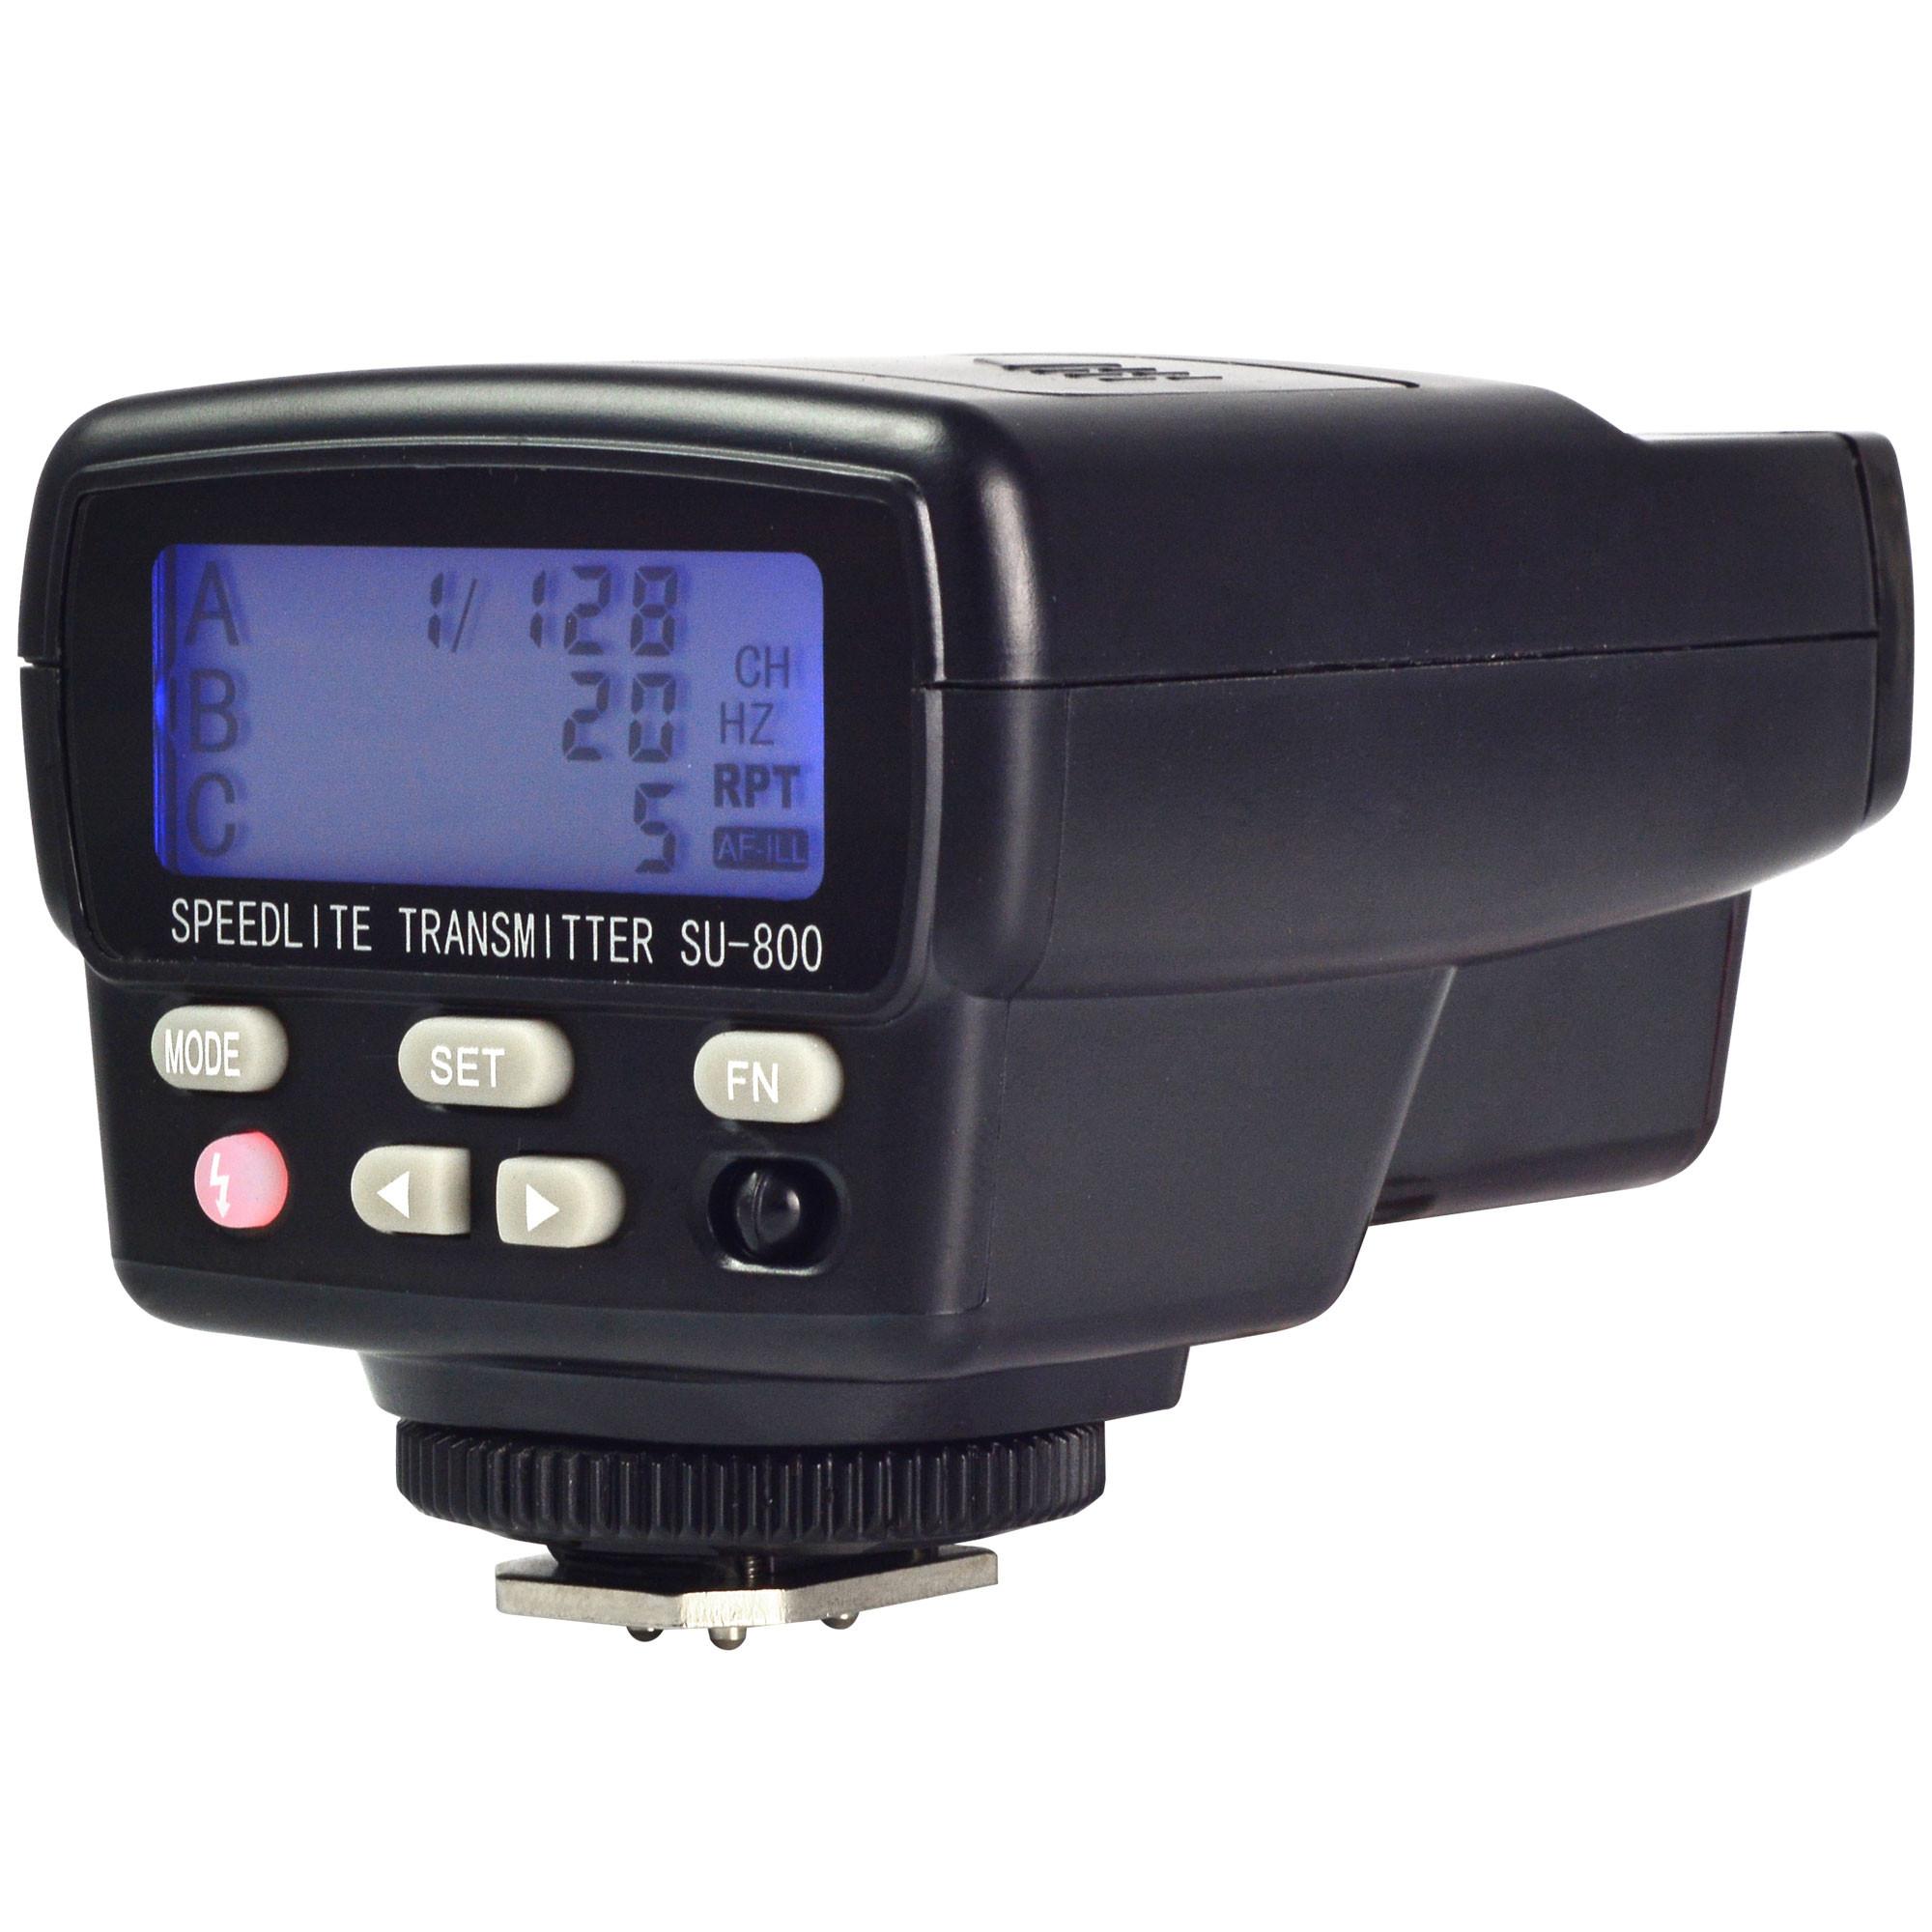 DEBAO® SU-800  i-TTL Infra-red Speedlite Wireless Transmitter For Nikon Camera